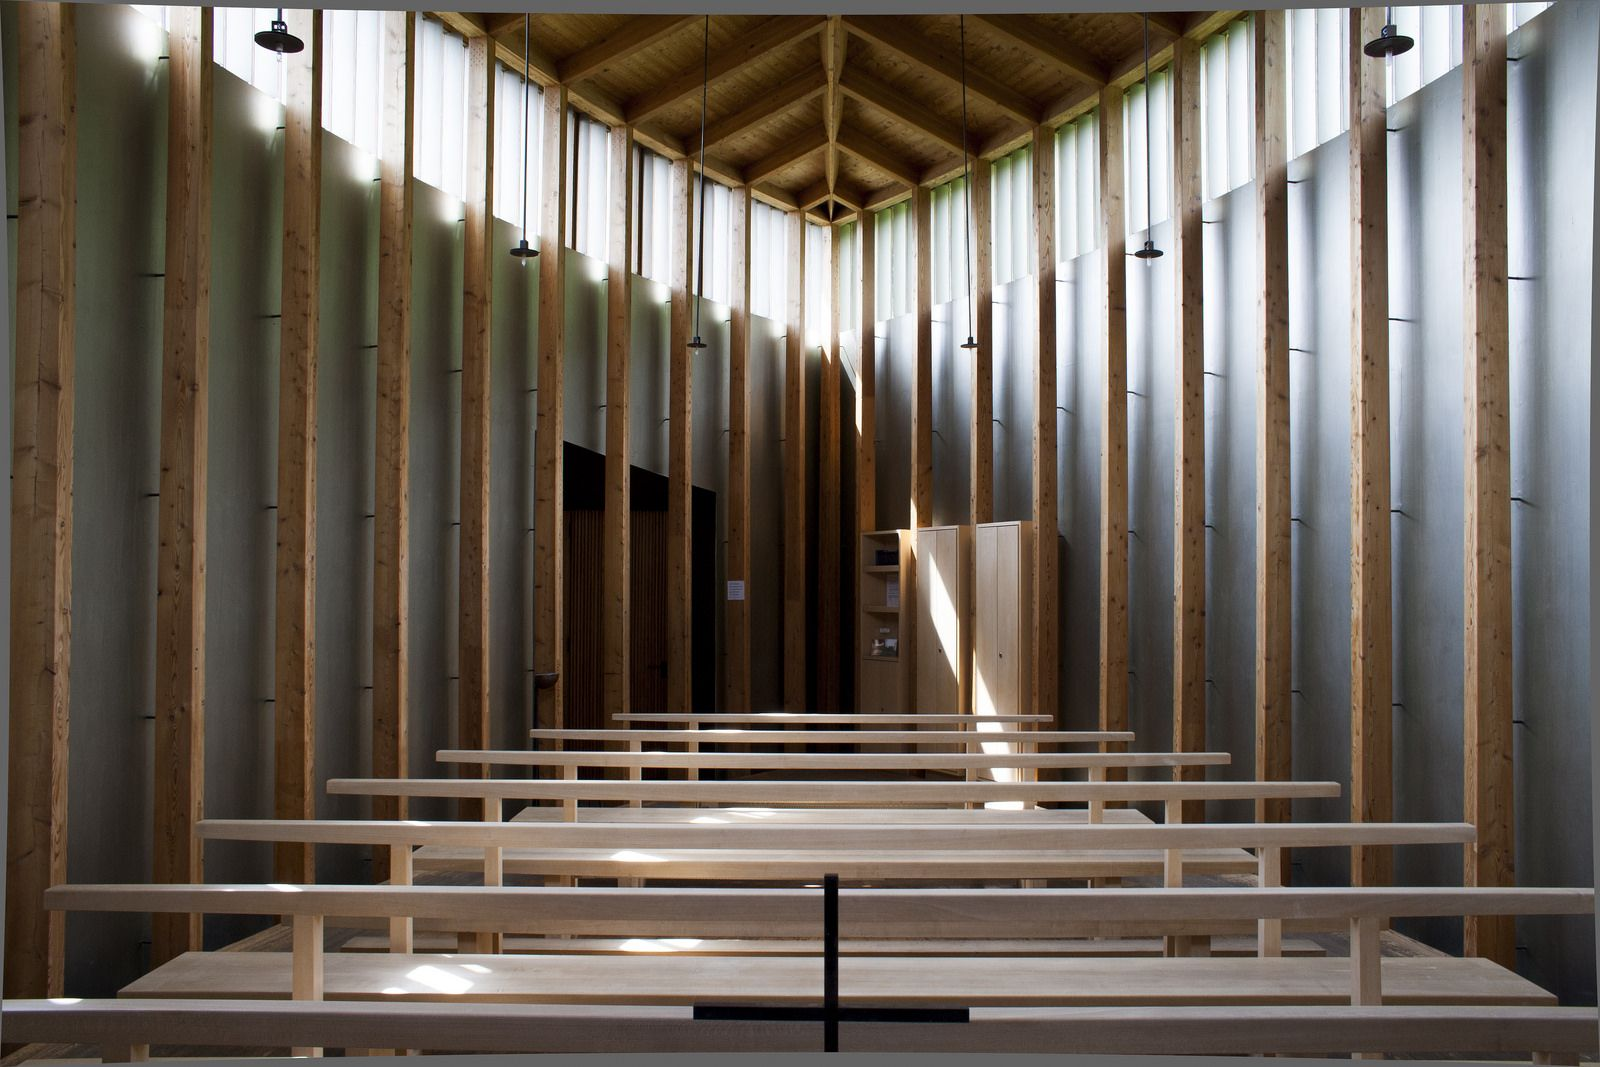 Saint Benedict Chapel. 1988. Peter Zumthor. Sumvitg, Graubünden, Switzerland // Photo: Alex Awramenko